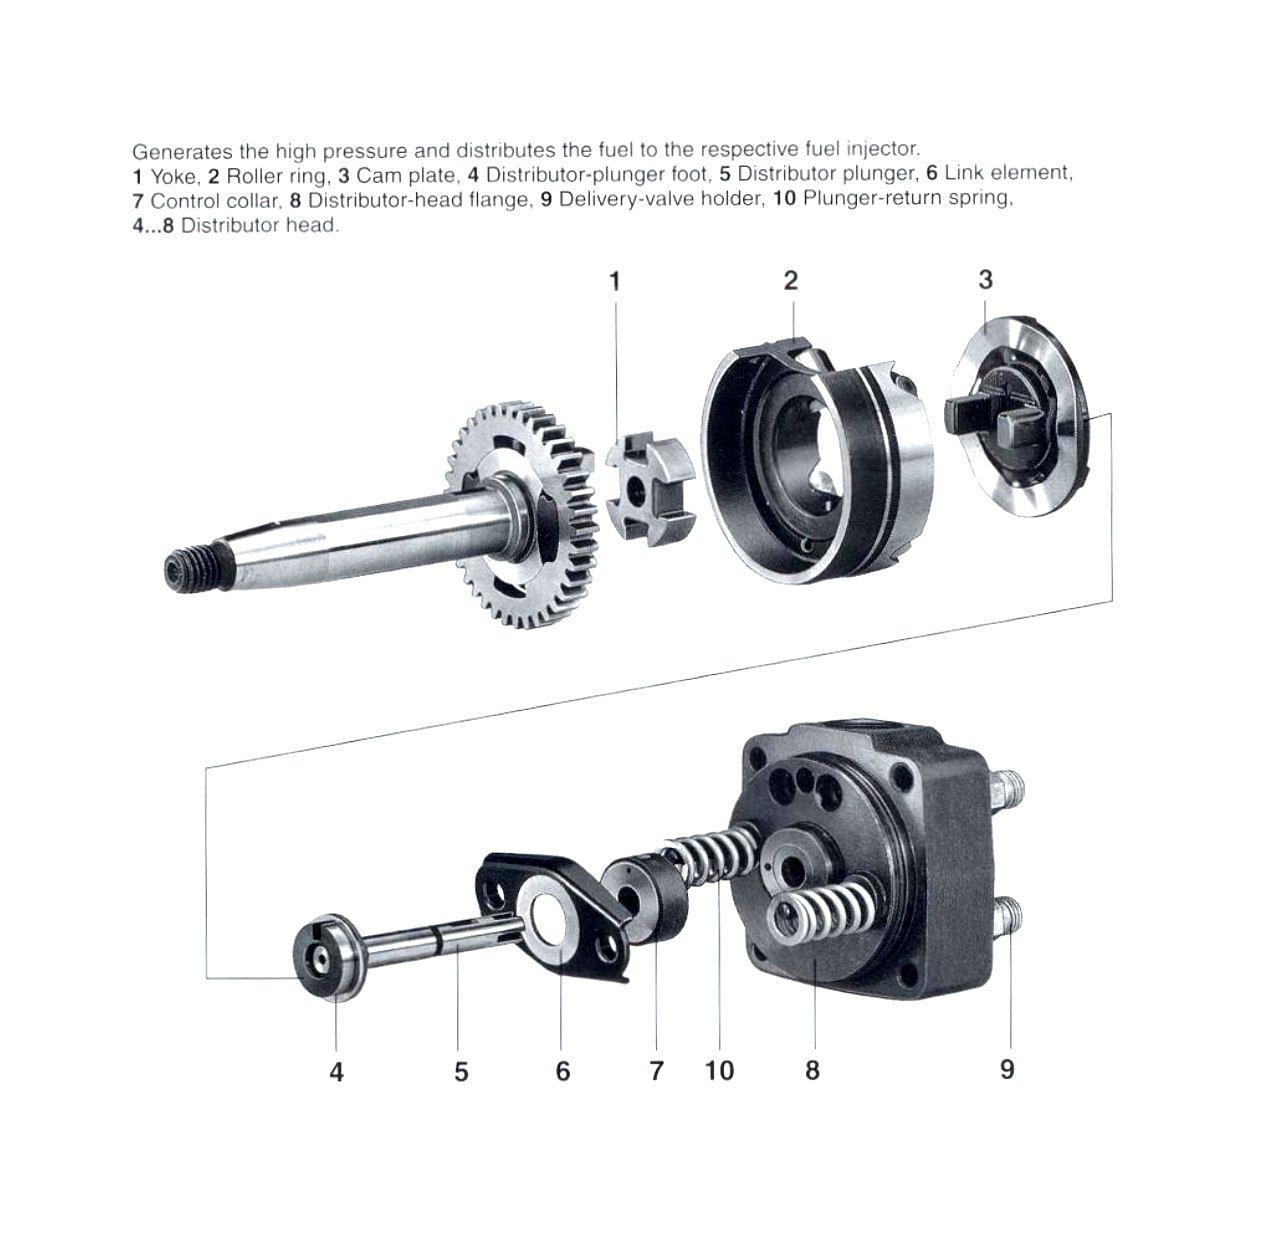 Diagram Bosch Diesel Injection Pump Diagram Bosch Ve Injection Pump